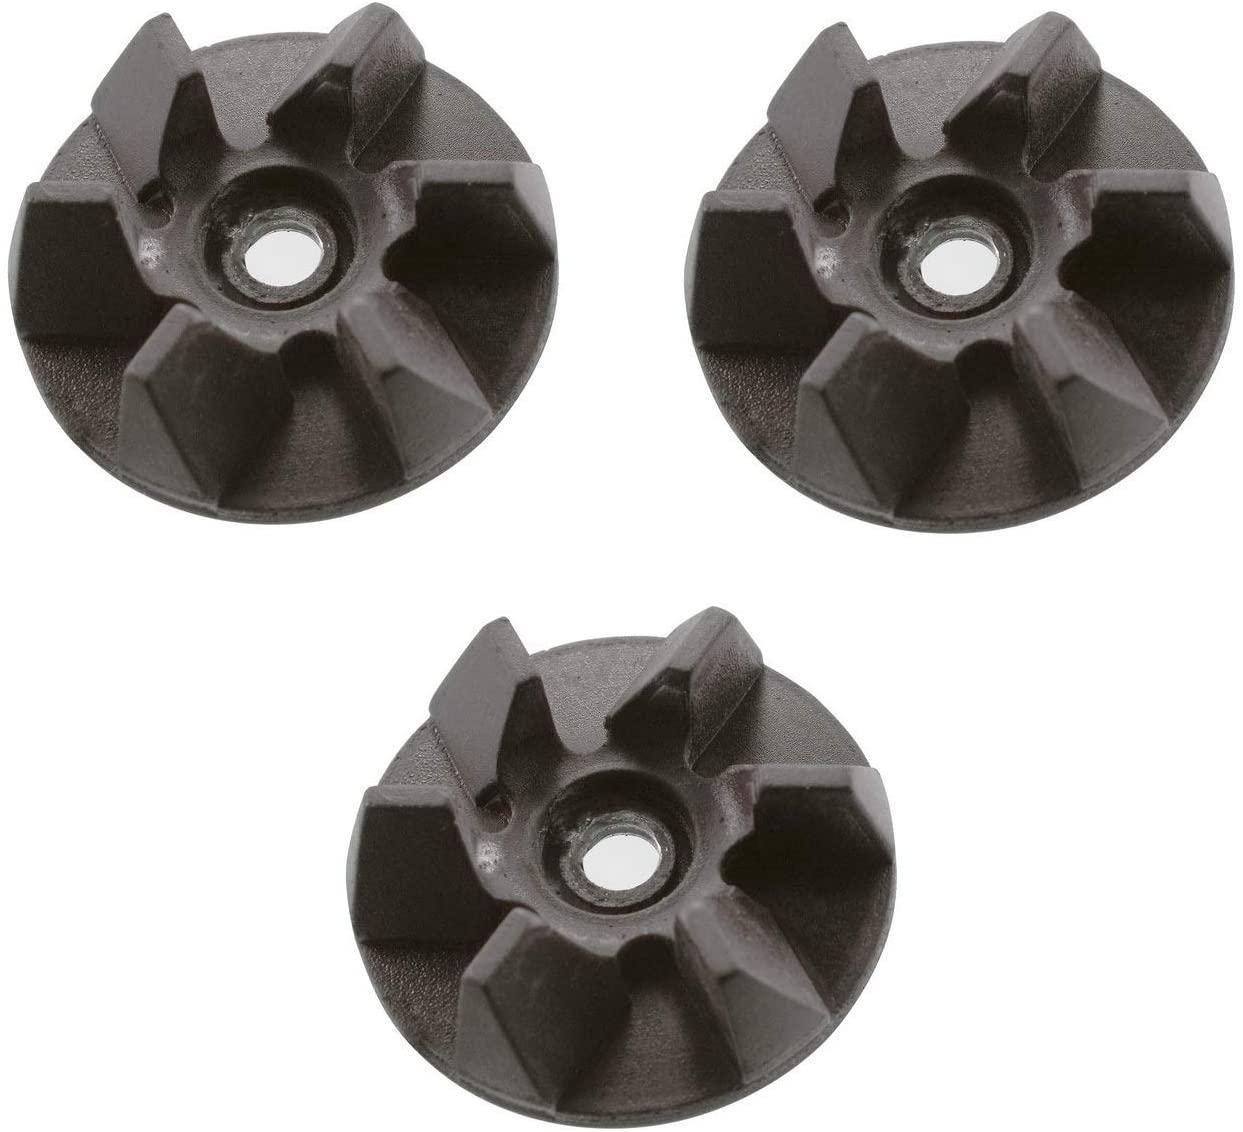 Univen Blender Rubber Drive Clutch Coupling (3)